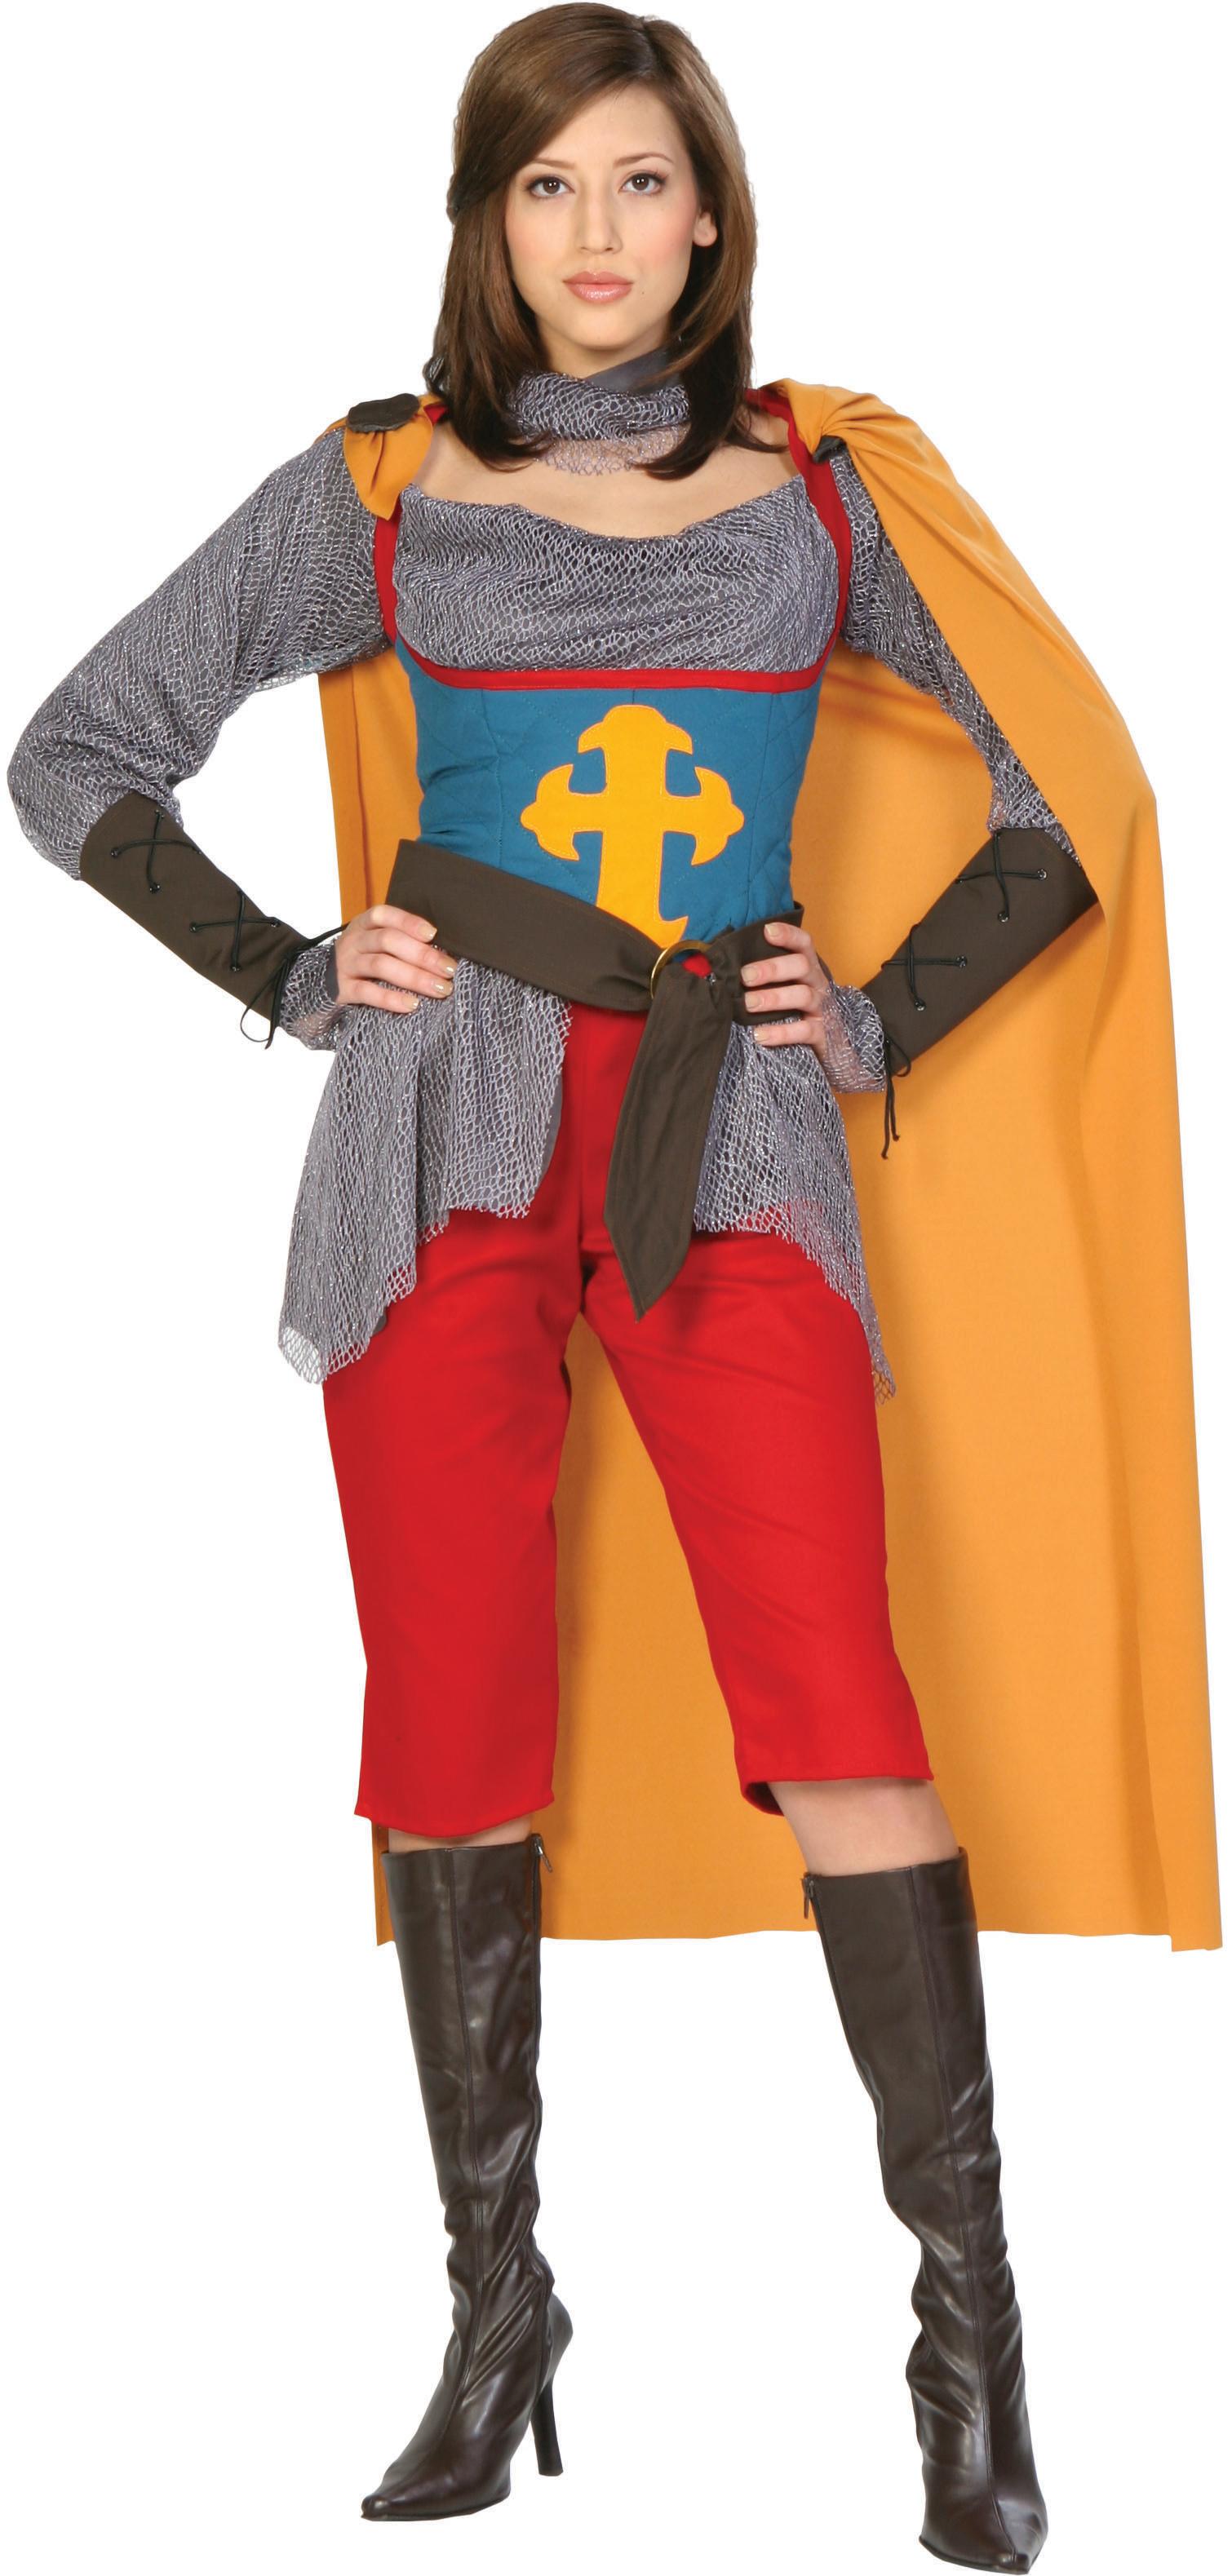 Joan Of Arc Adult Costume - SpicyLegs.com